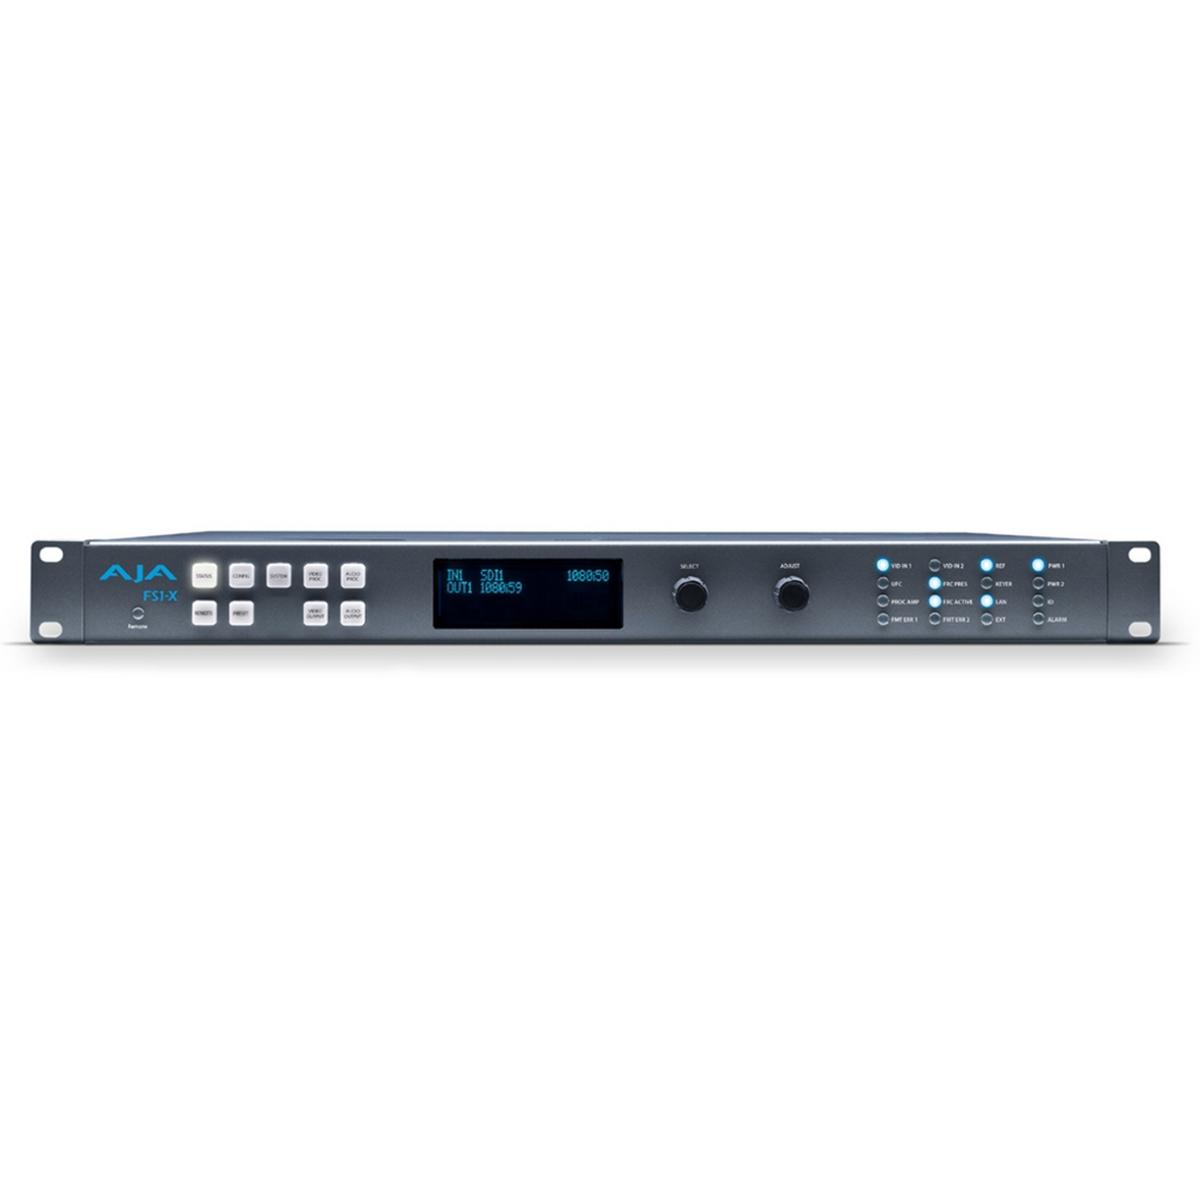 Buy AJA: FS1-X Frame Sync/Converter with MADI audio